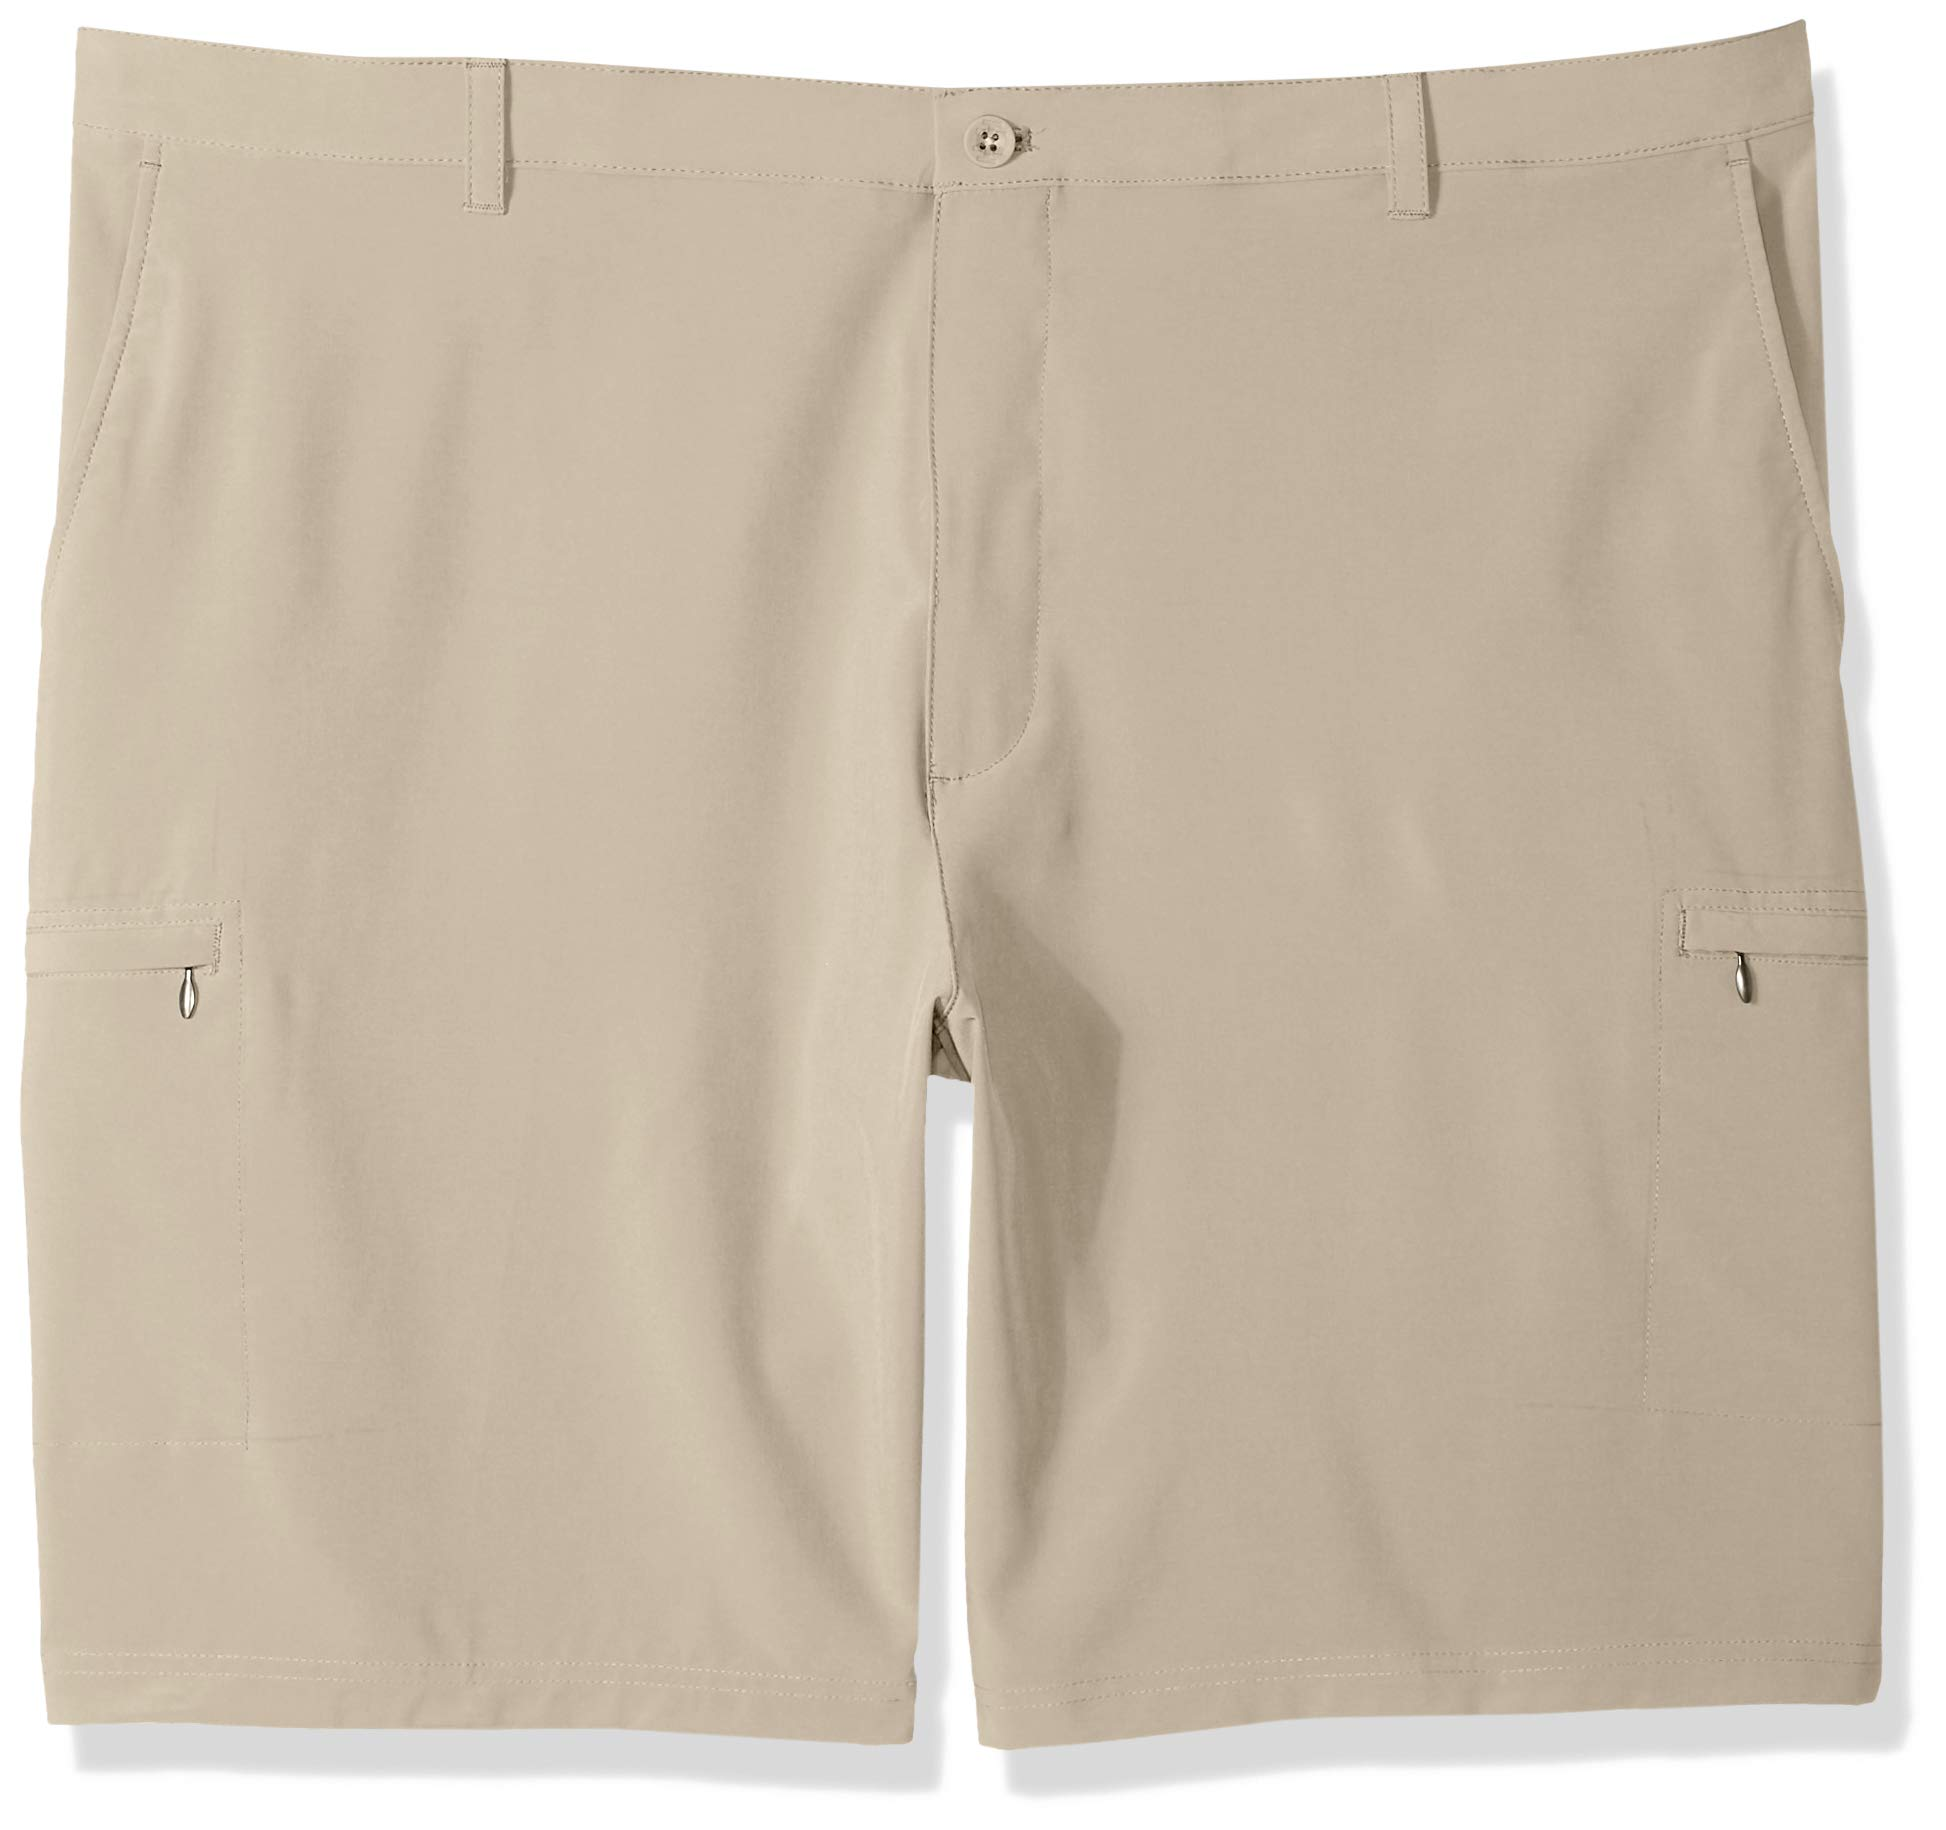 IZOD Men's Big and Tall Golf Swing Flex Stretch Cargo Short, red Khaki, 46